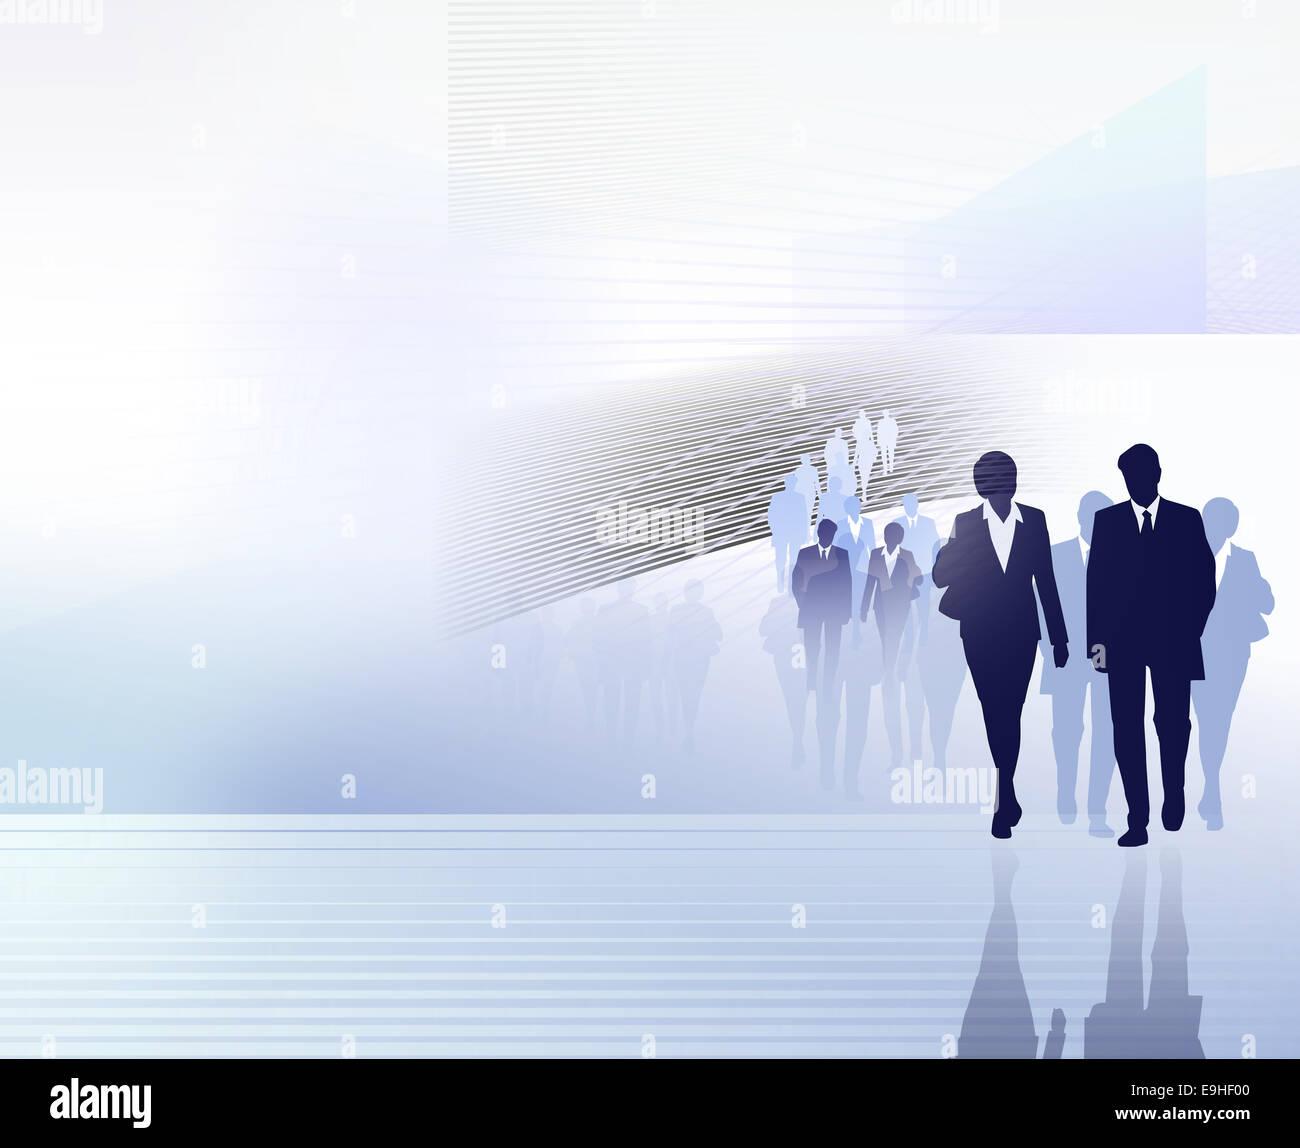 people business illustration - Stock Image